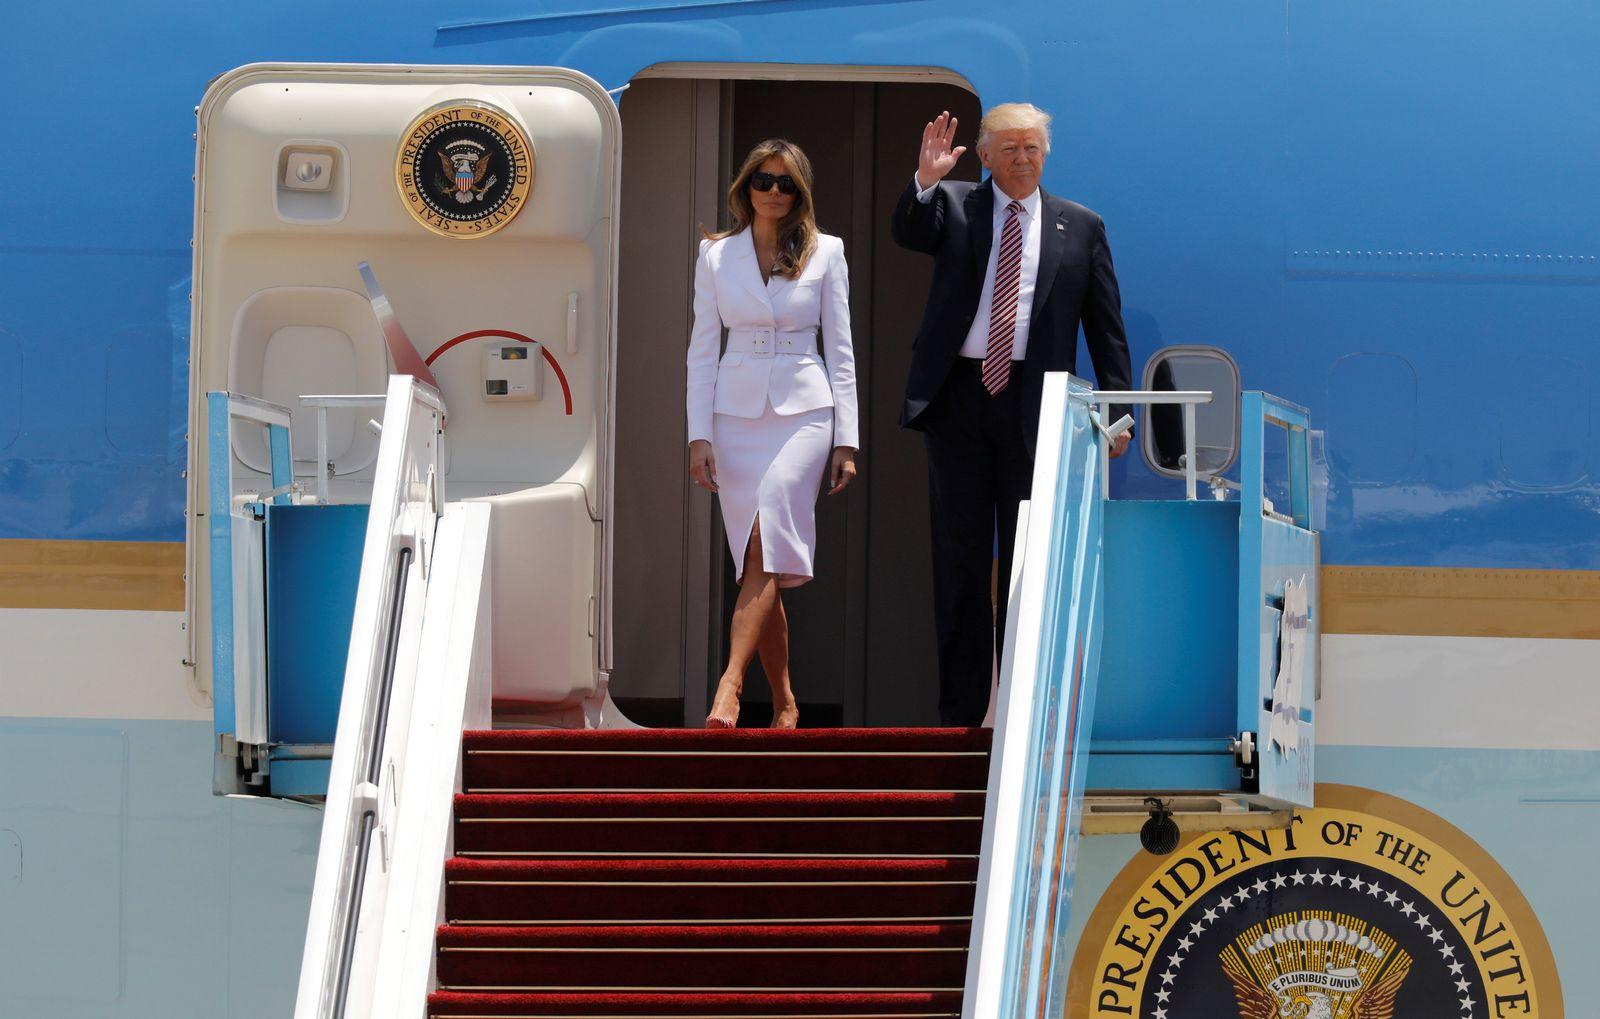 Israel /Donald Trump / Melania Trump